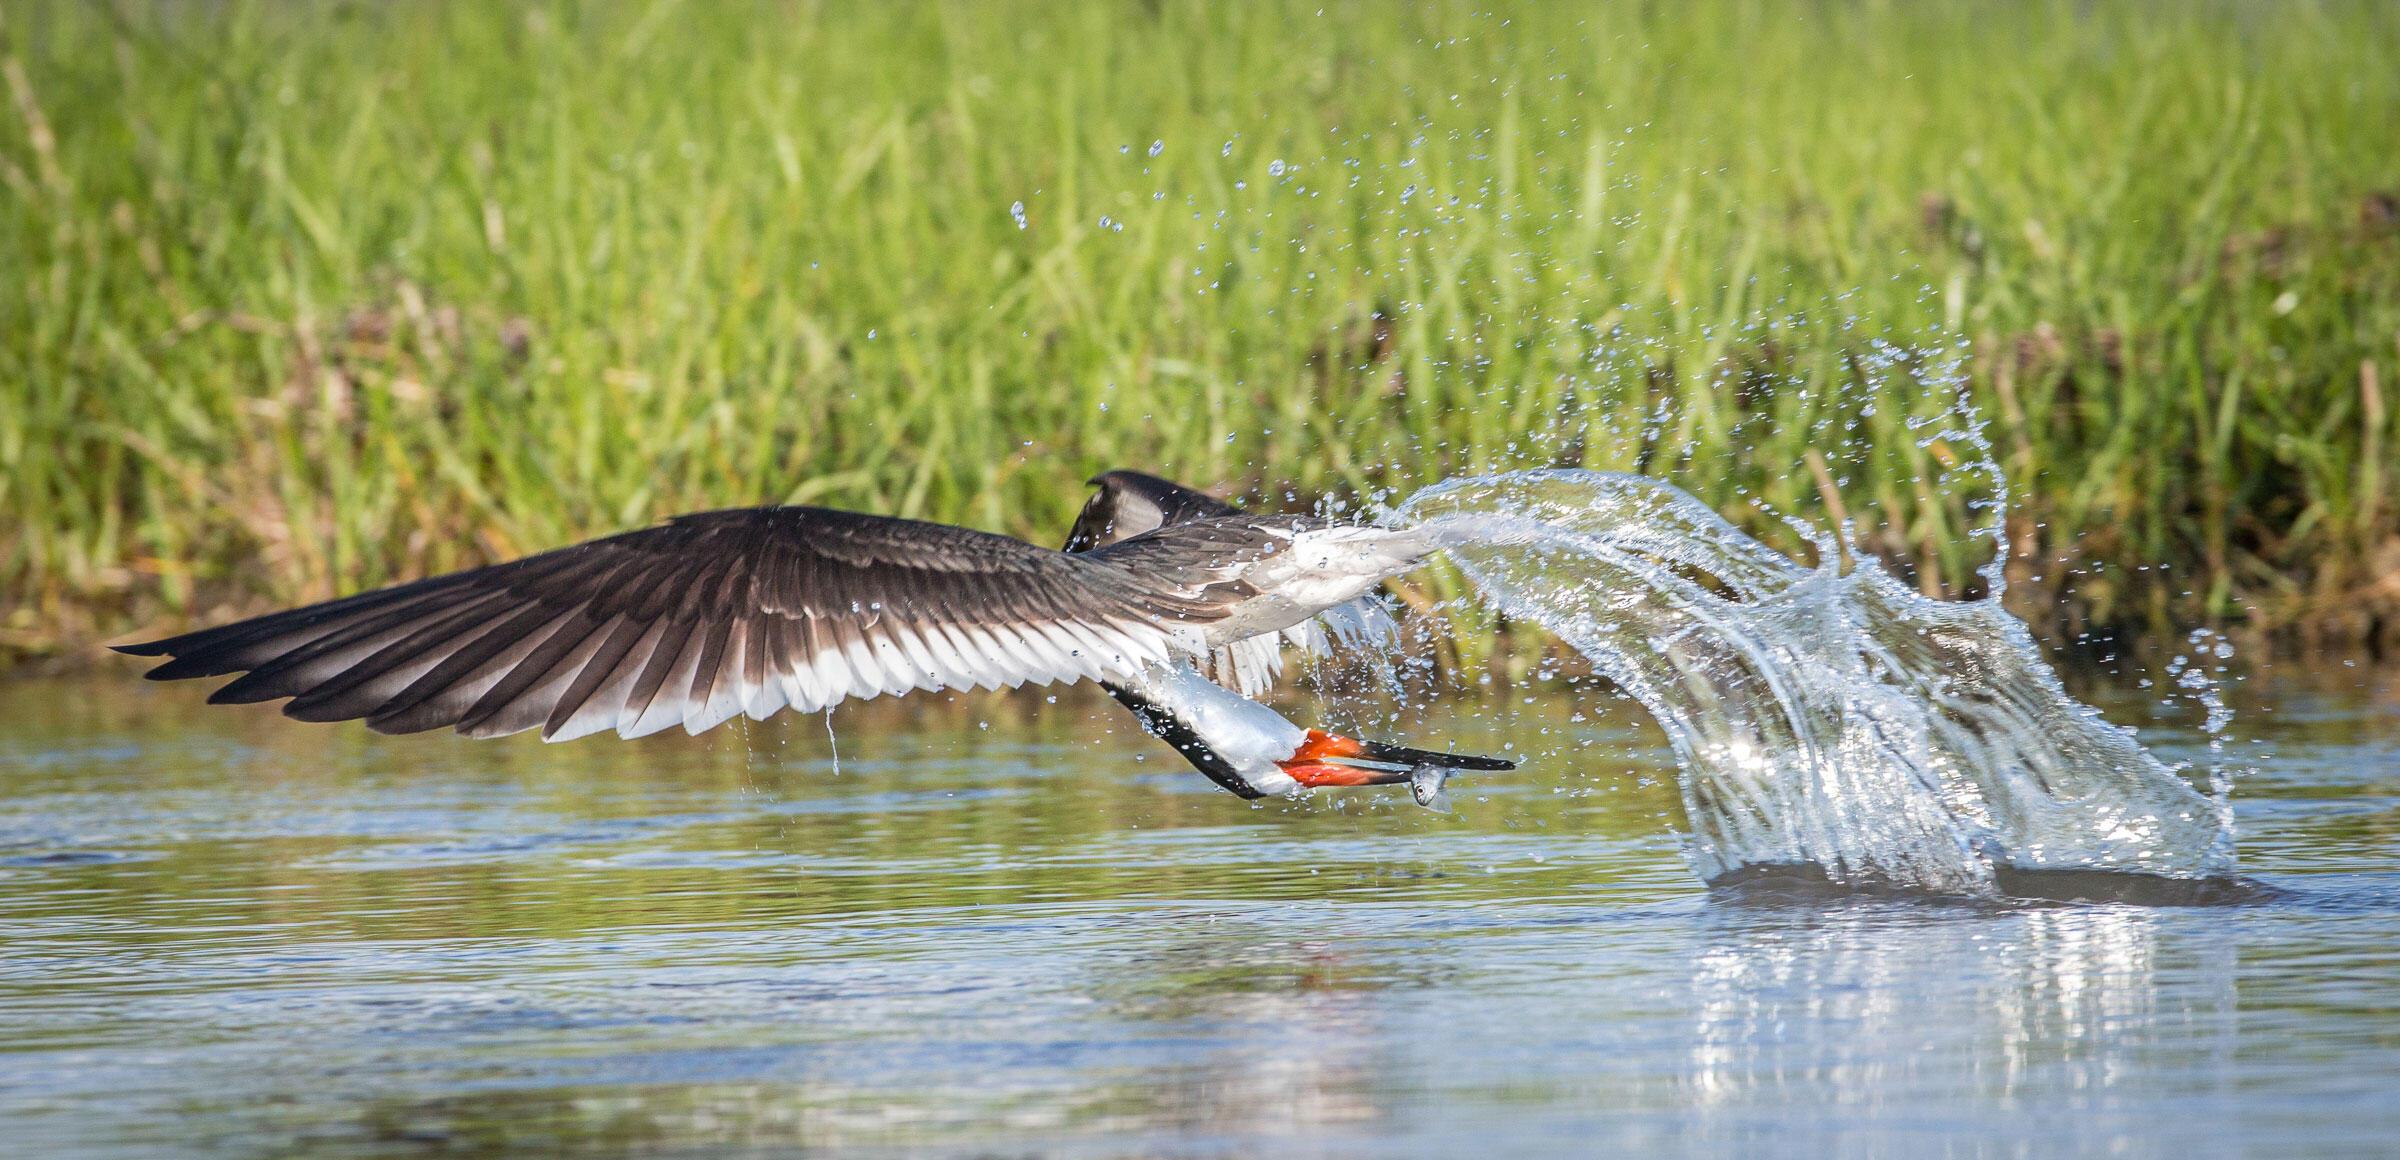 Black Skimmer/Professional Category. Mark Buckler/Audubon Photography Awards